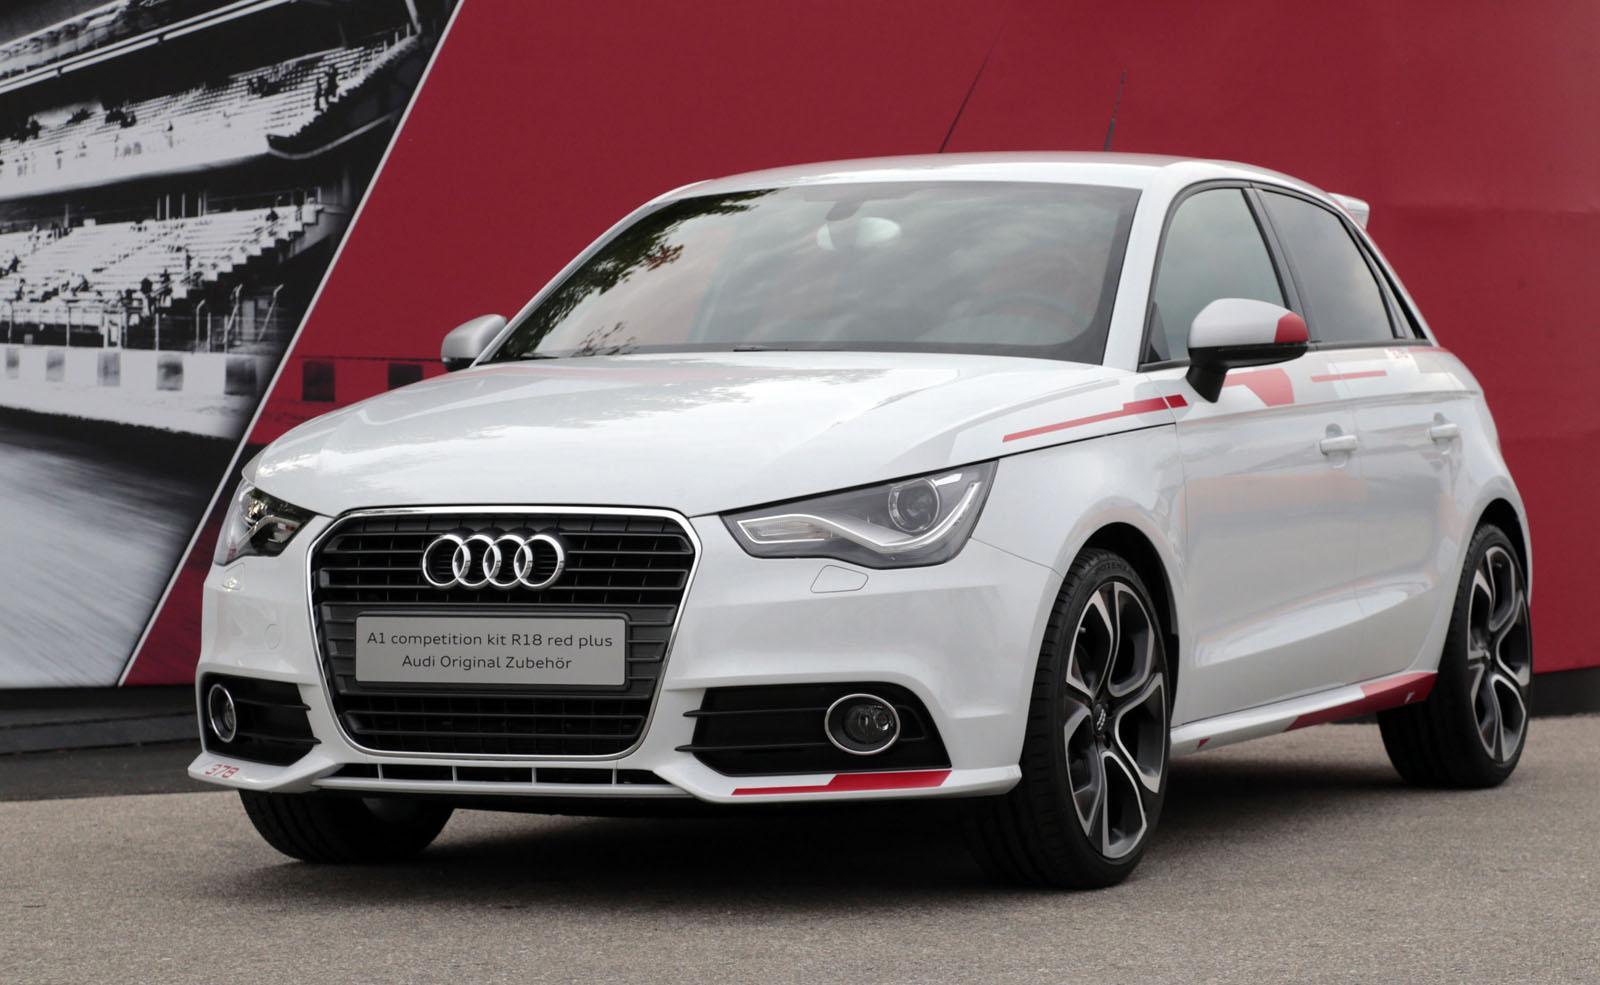 Audi escondido parts 4